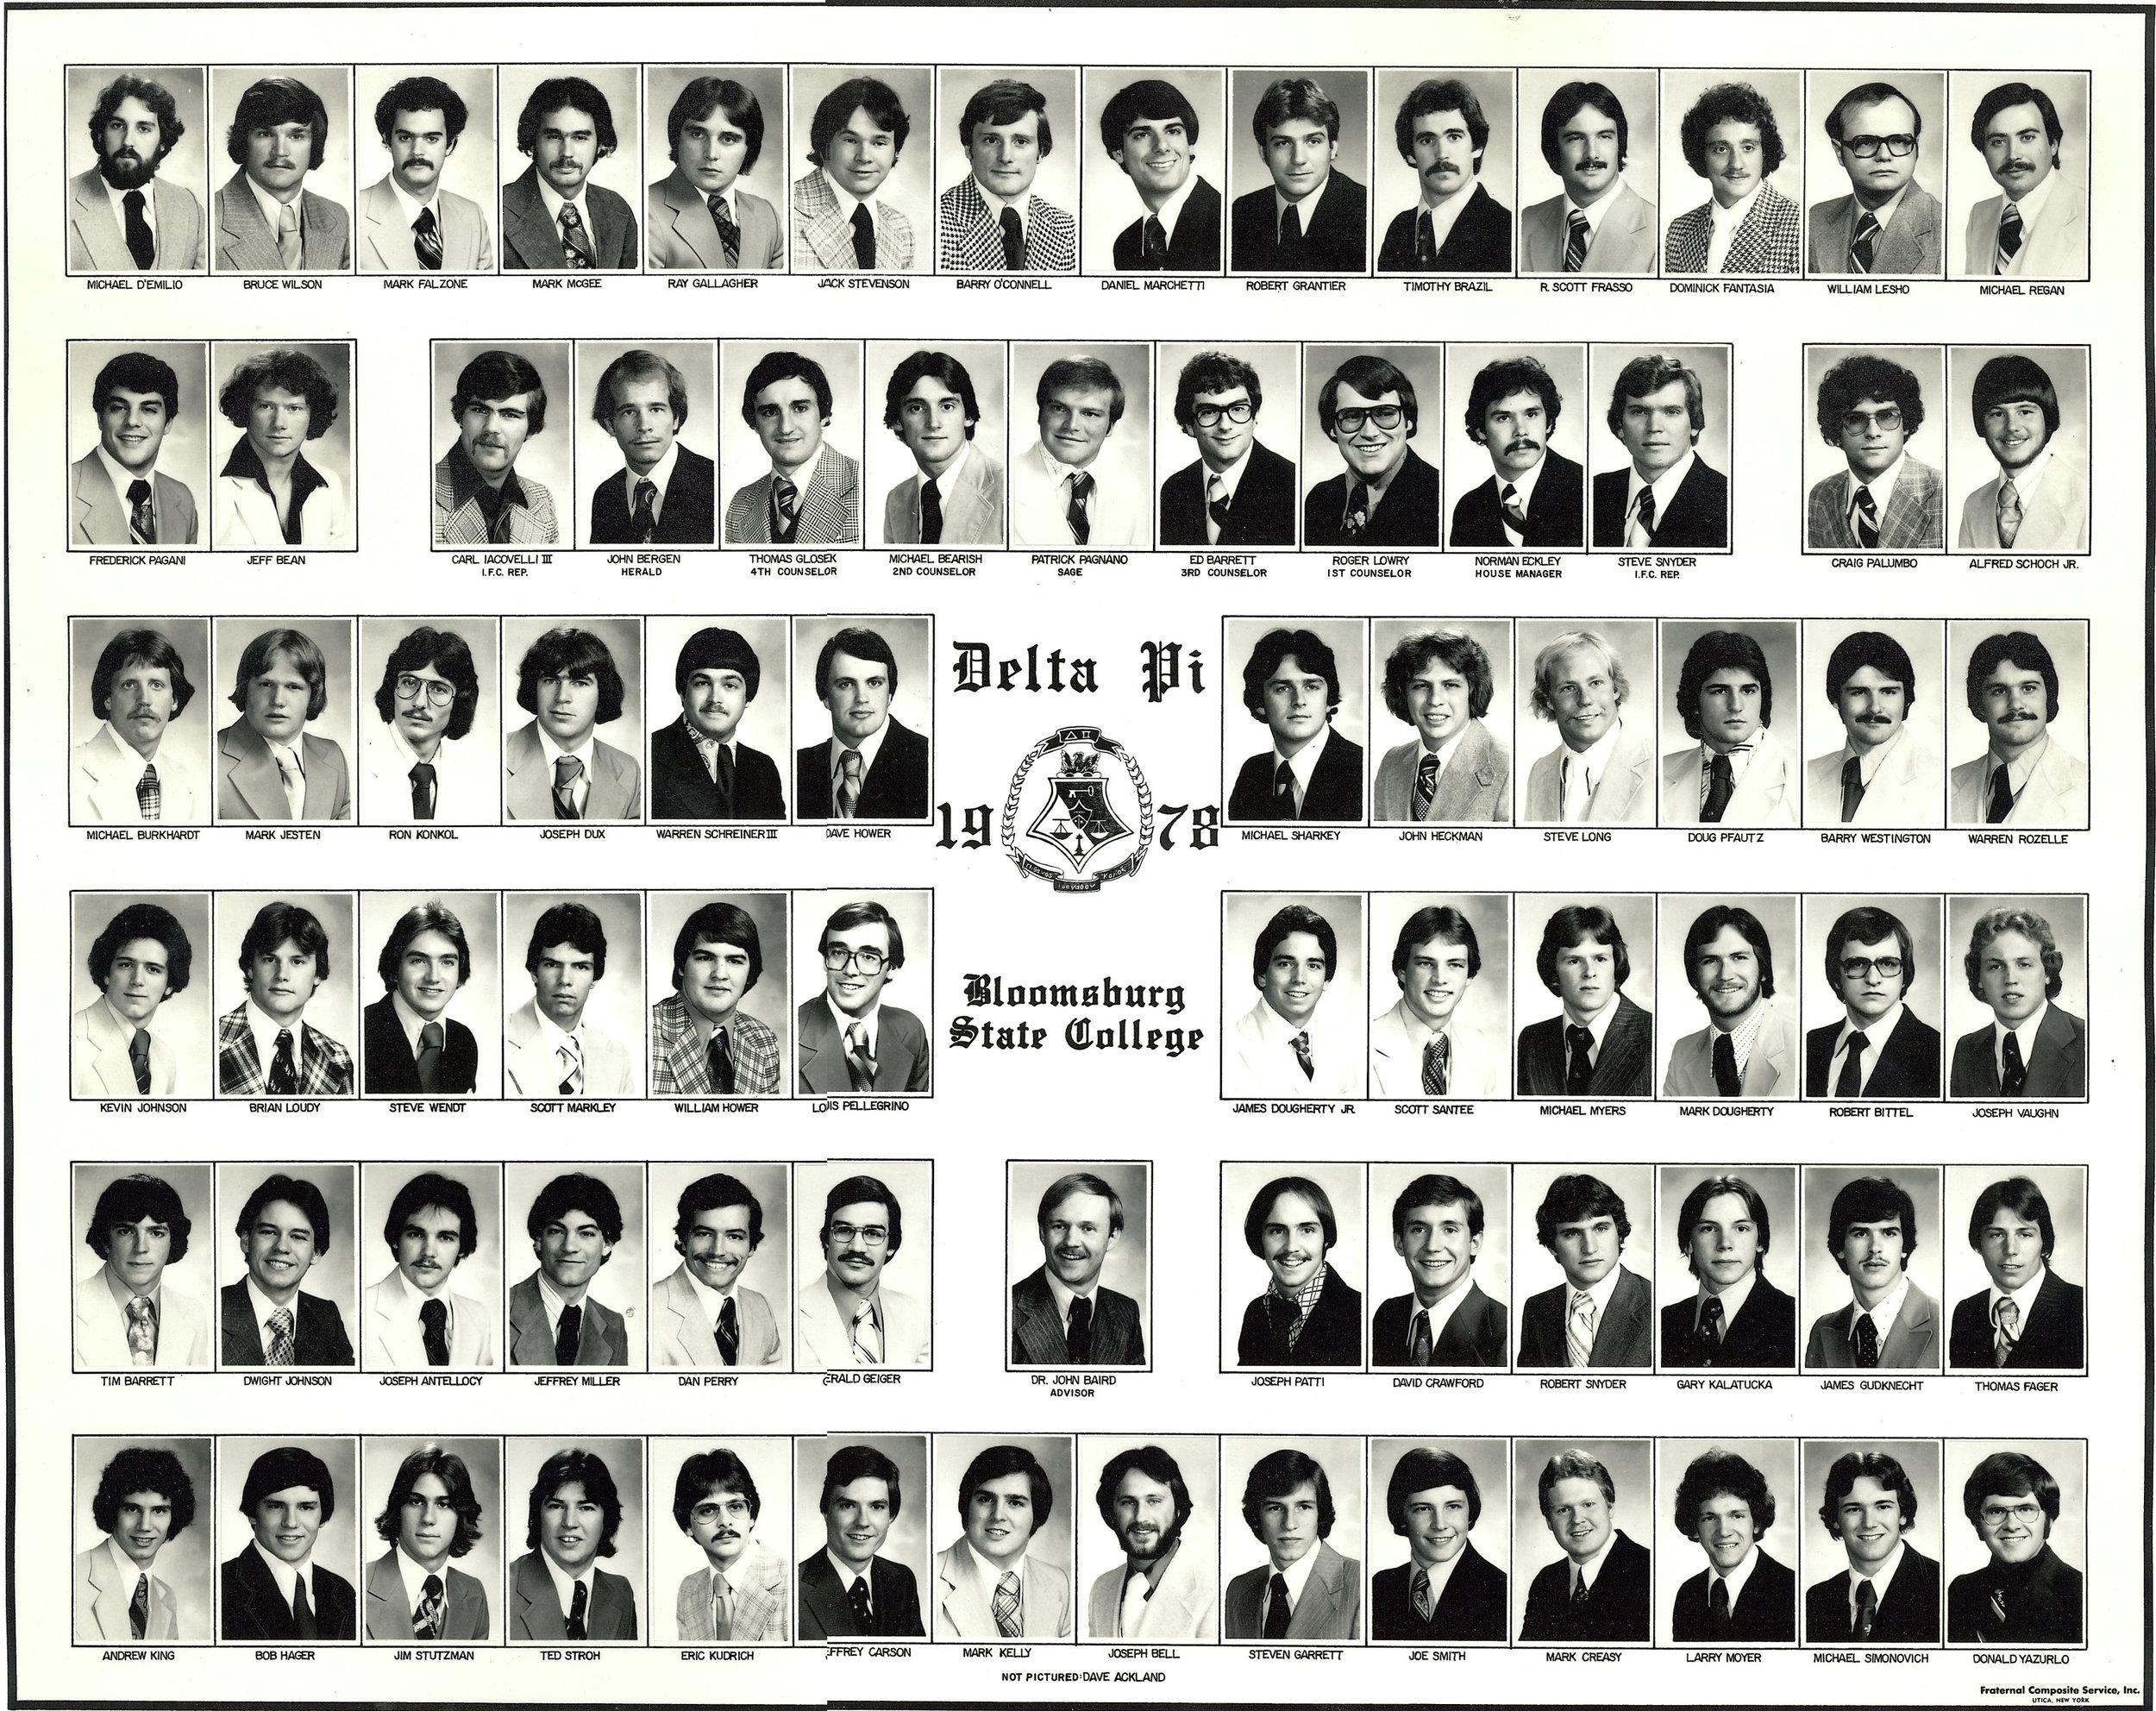 DeltaPi-1978-FinalEdit.jpg